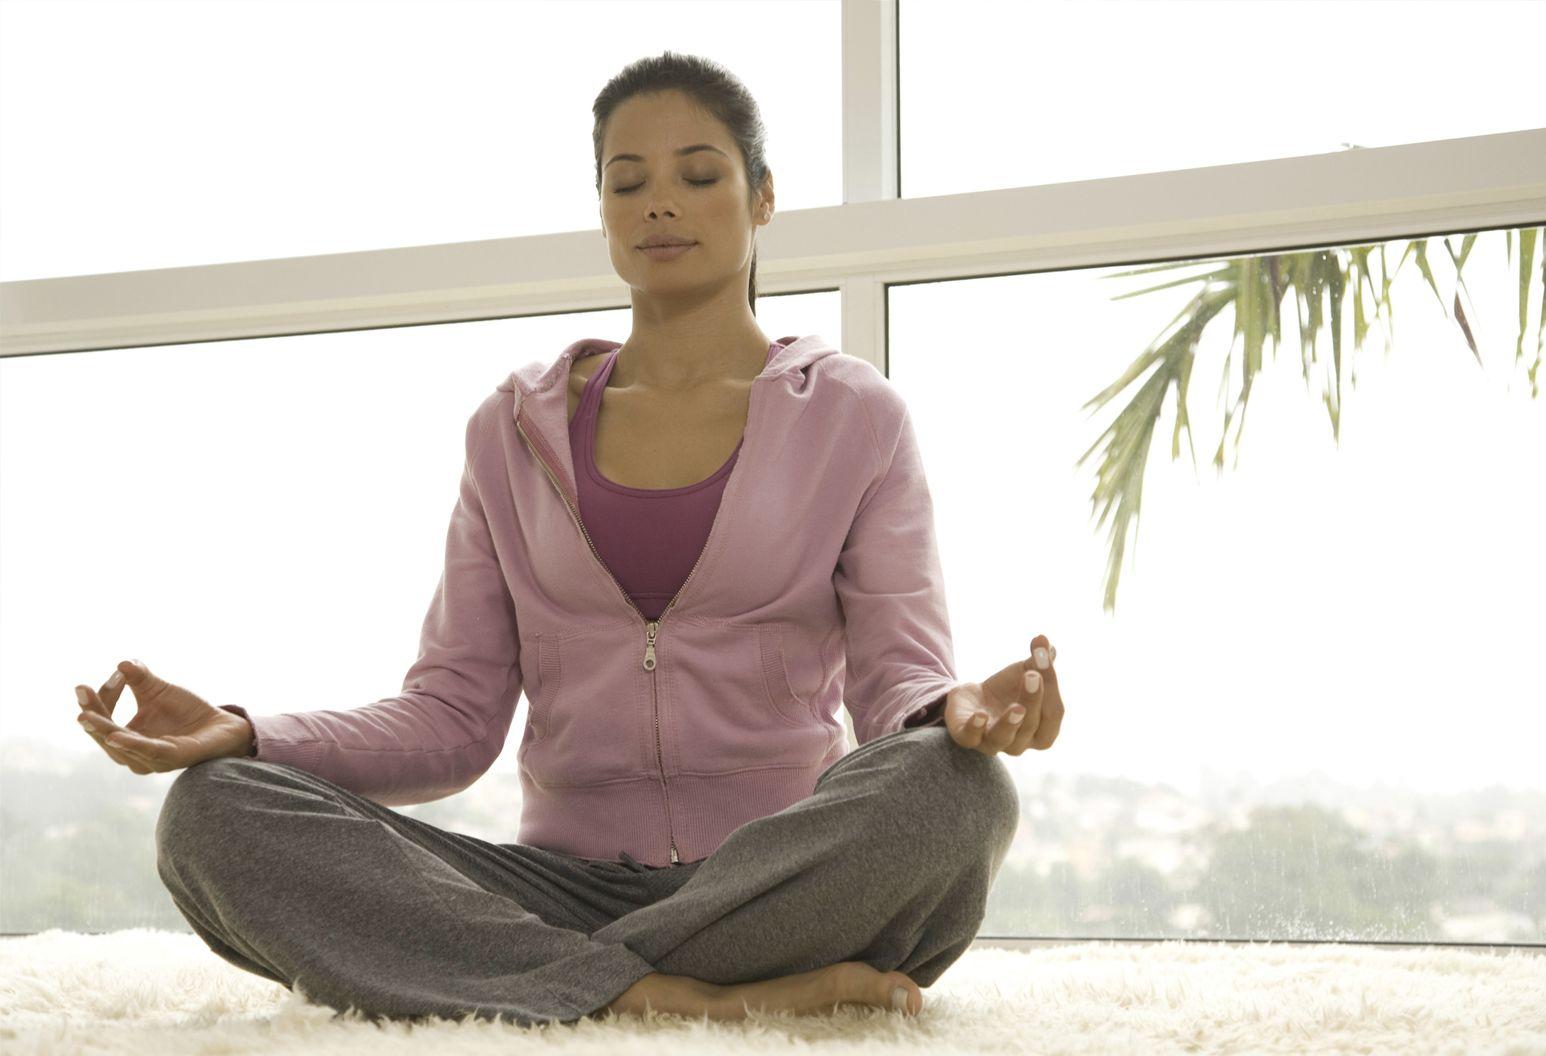 A women meditating in a cross legged pose.